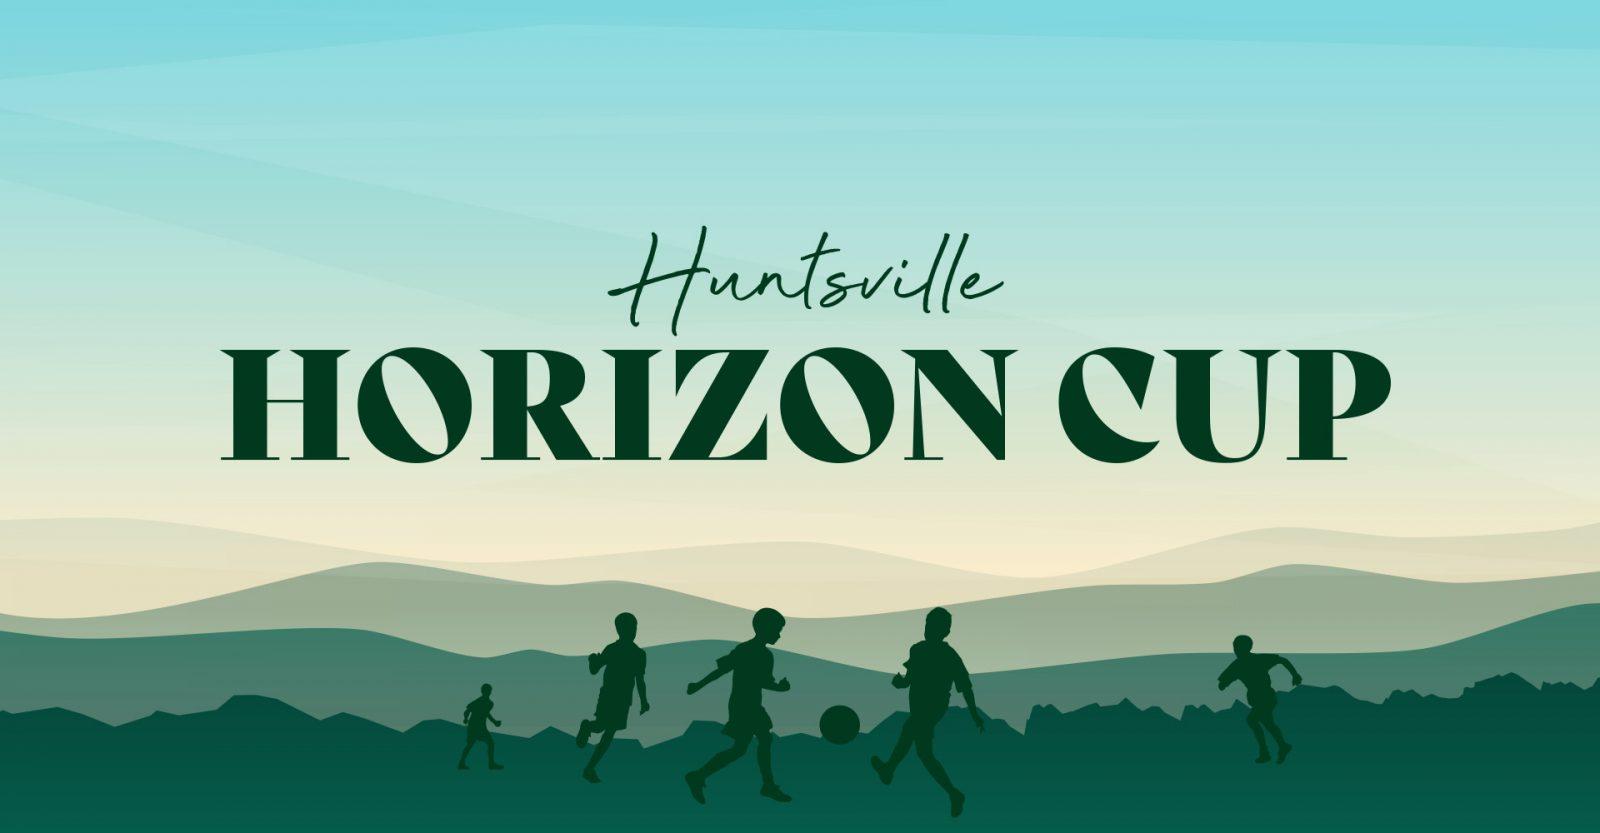 Huntsville Horizon Cup logo illustration